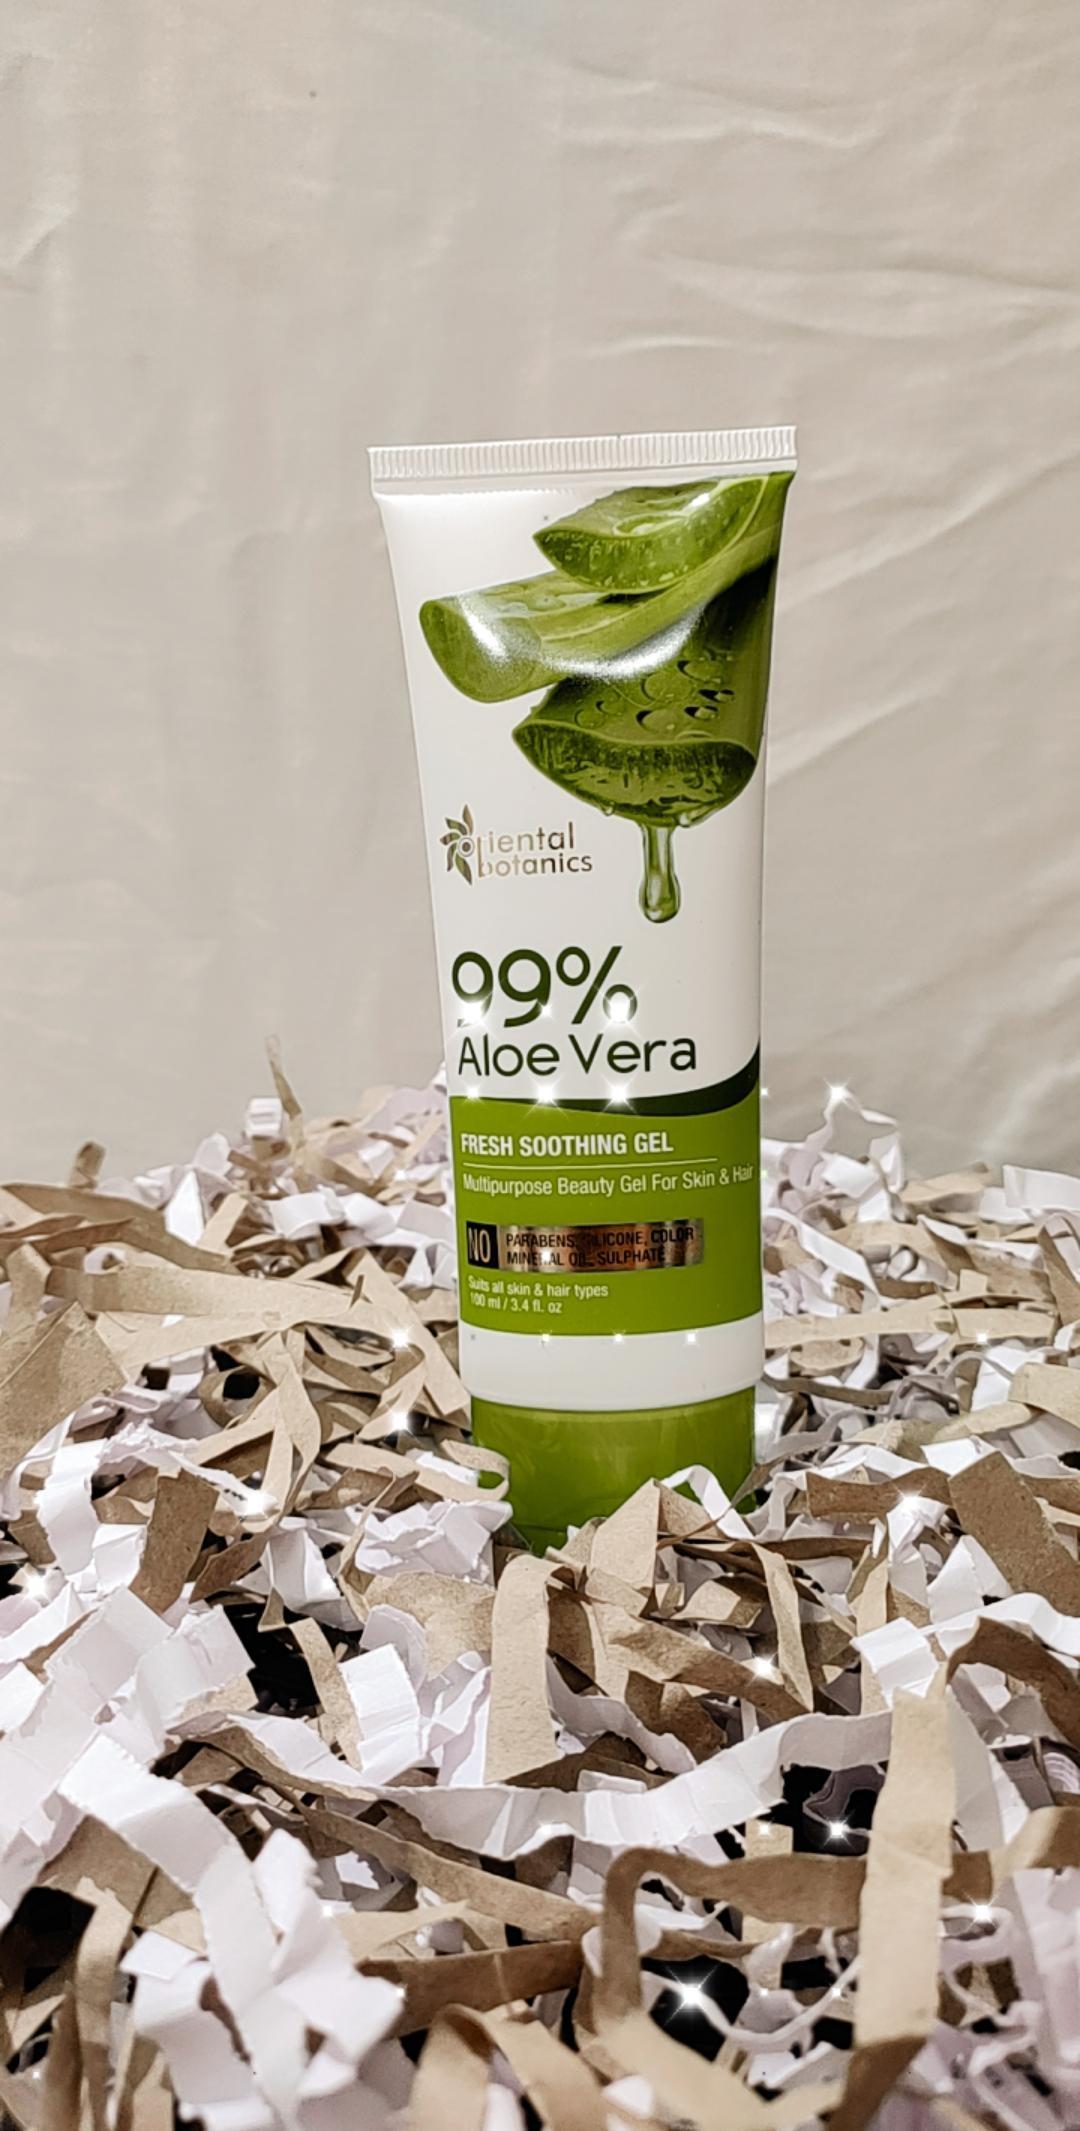 Oriental Botanics 99% Aloe Vera Fresh Soothing Gel For Skin & Hair-Life saviour product!-By taniyawarke